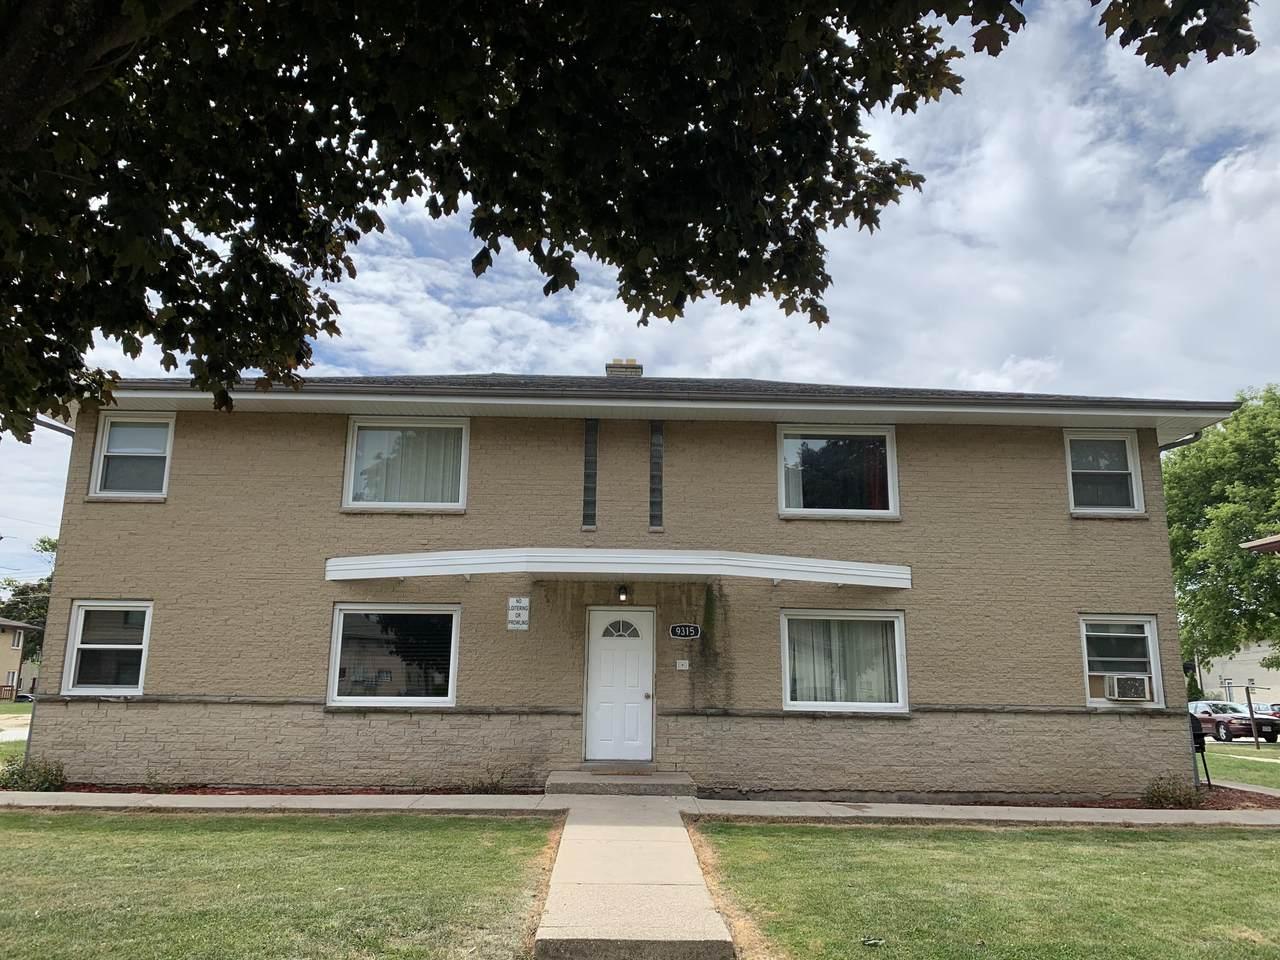 9315 Sheridan Ave - Photo 1